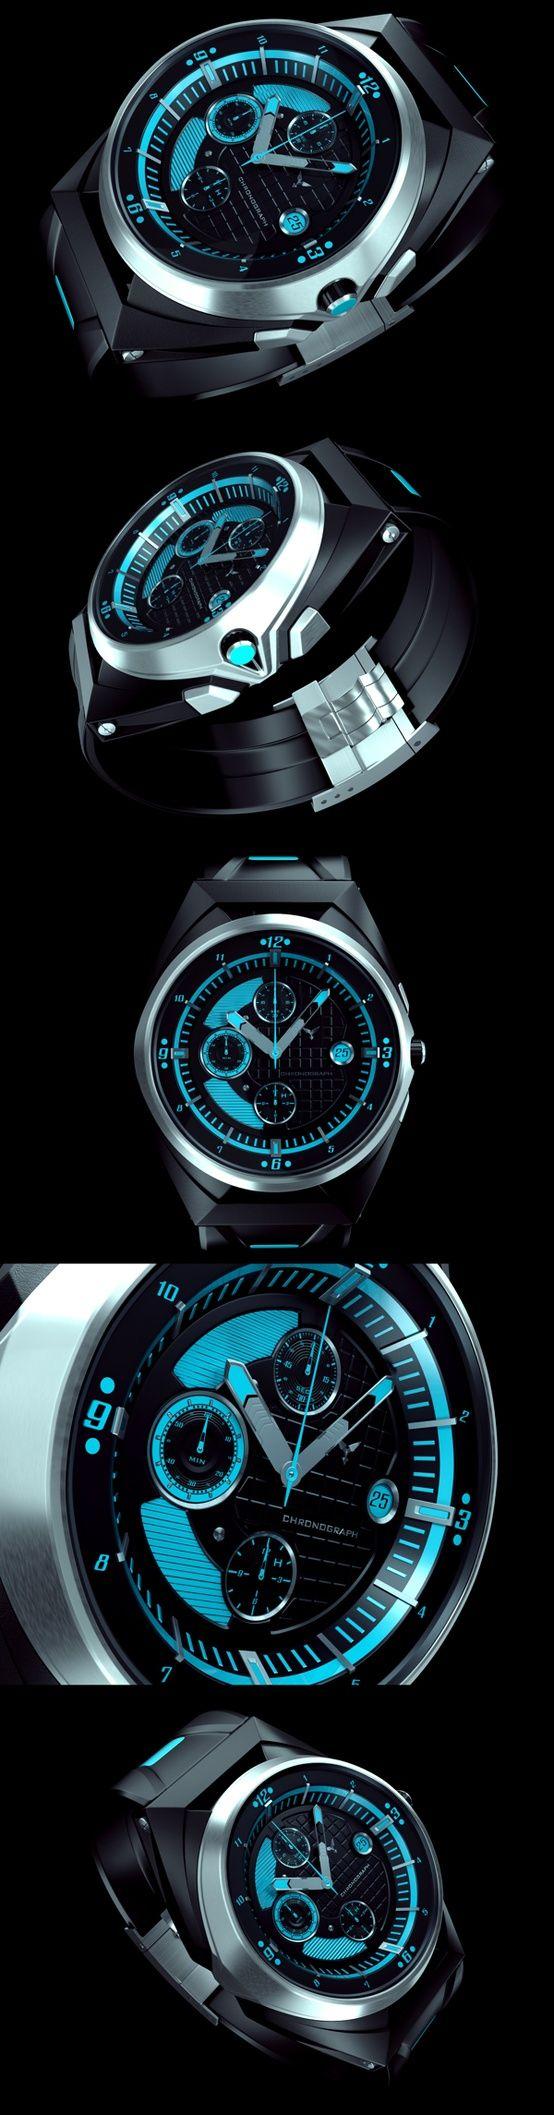 Gostei deste relógio.